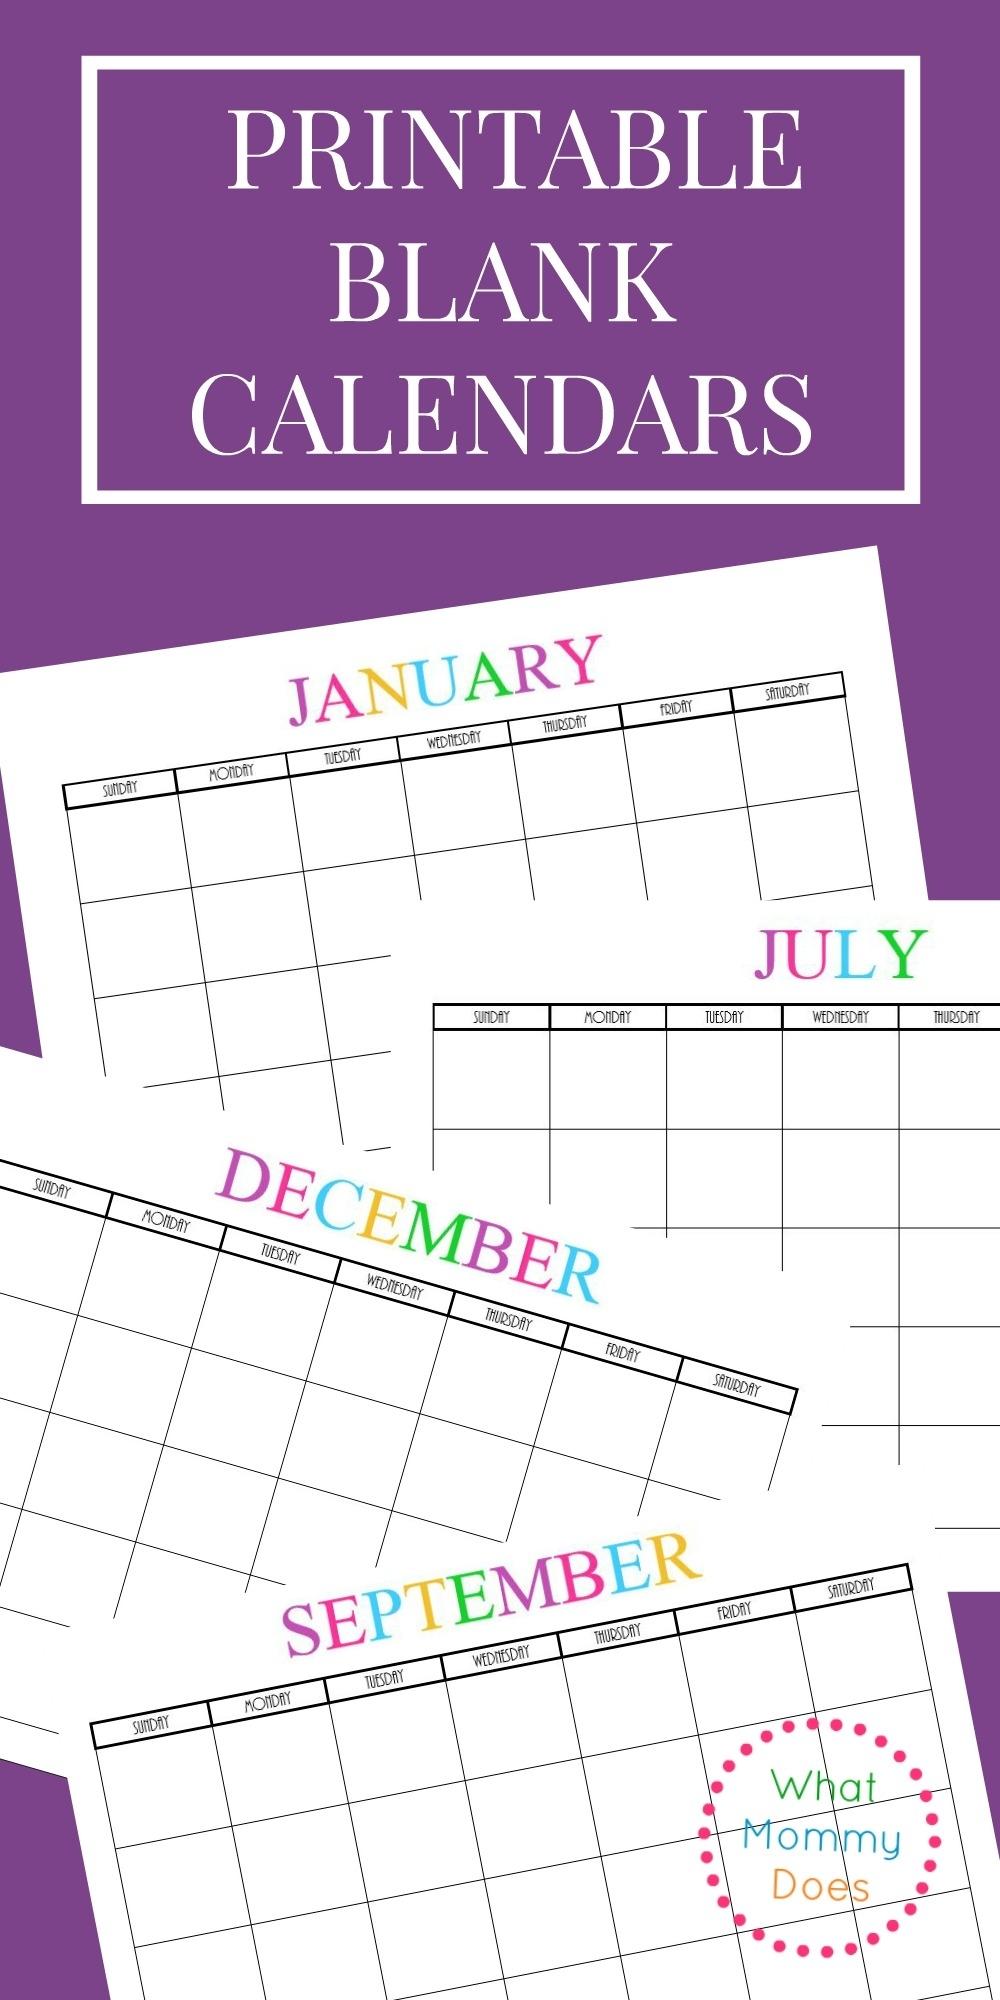 Free Printable Blank Monthly Calendars - 2020, 2021, 2022 inside 2019 2020 Calendar Printable Color In